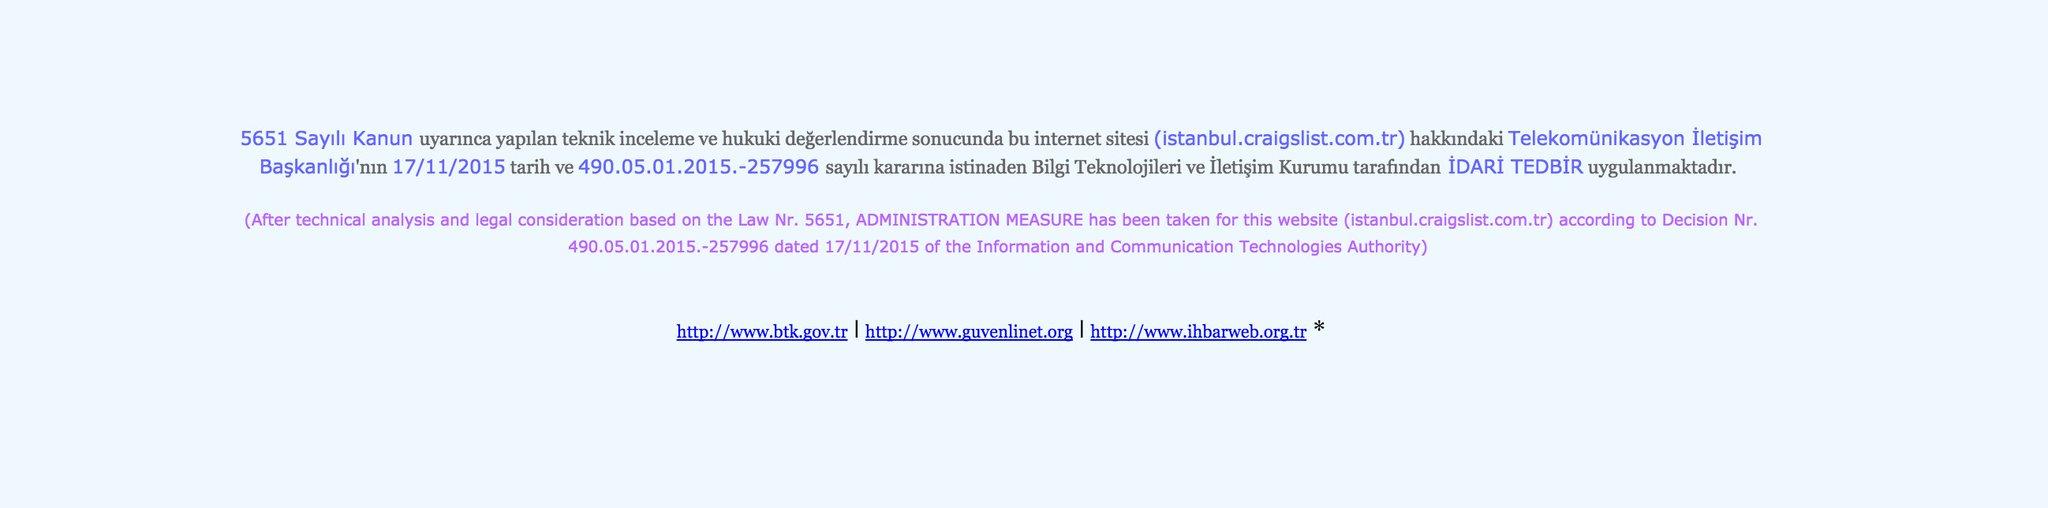 Craigslist istanbul